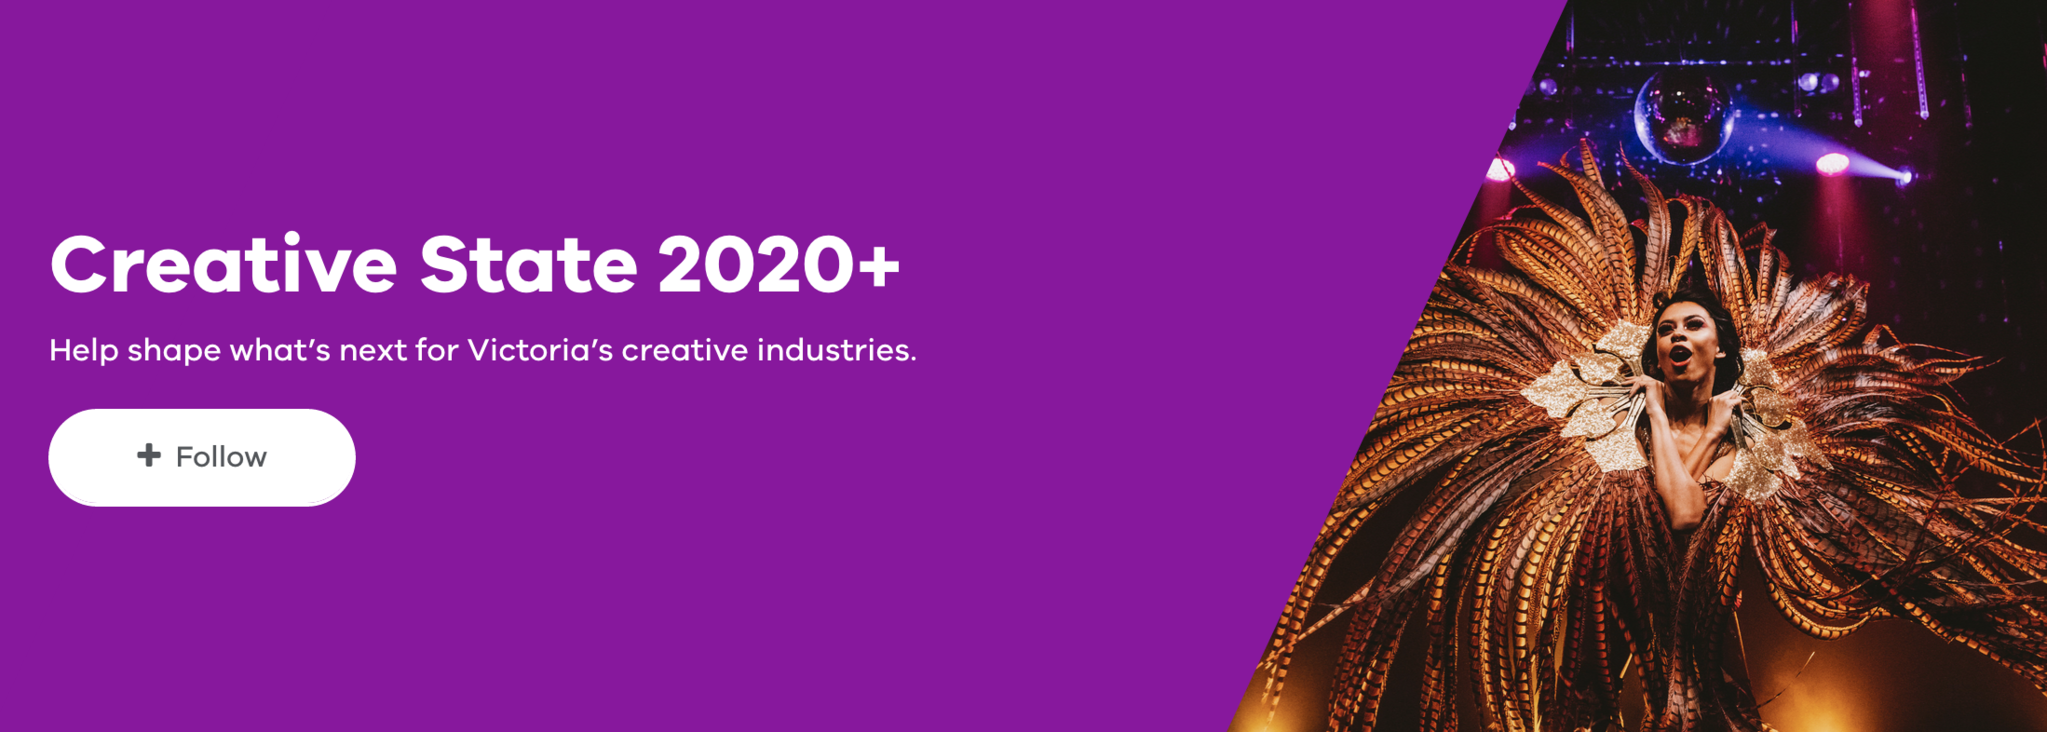 Creative State 2020+